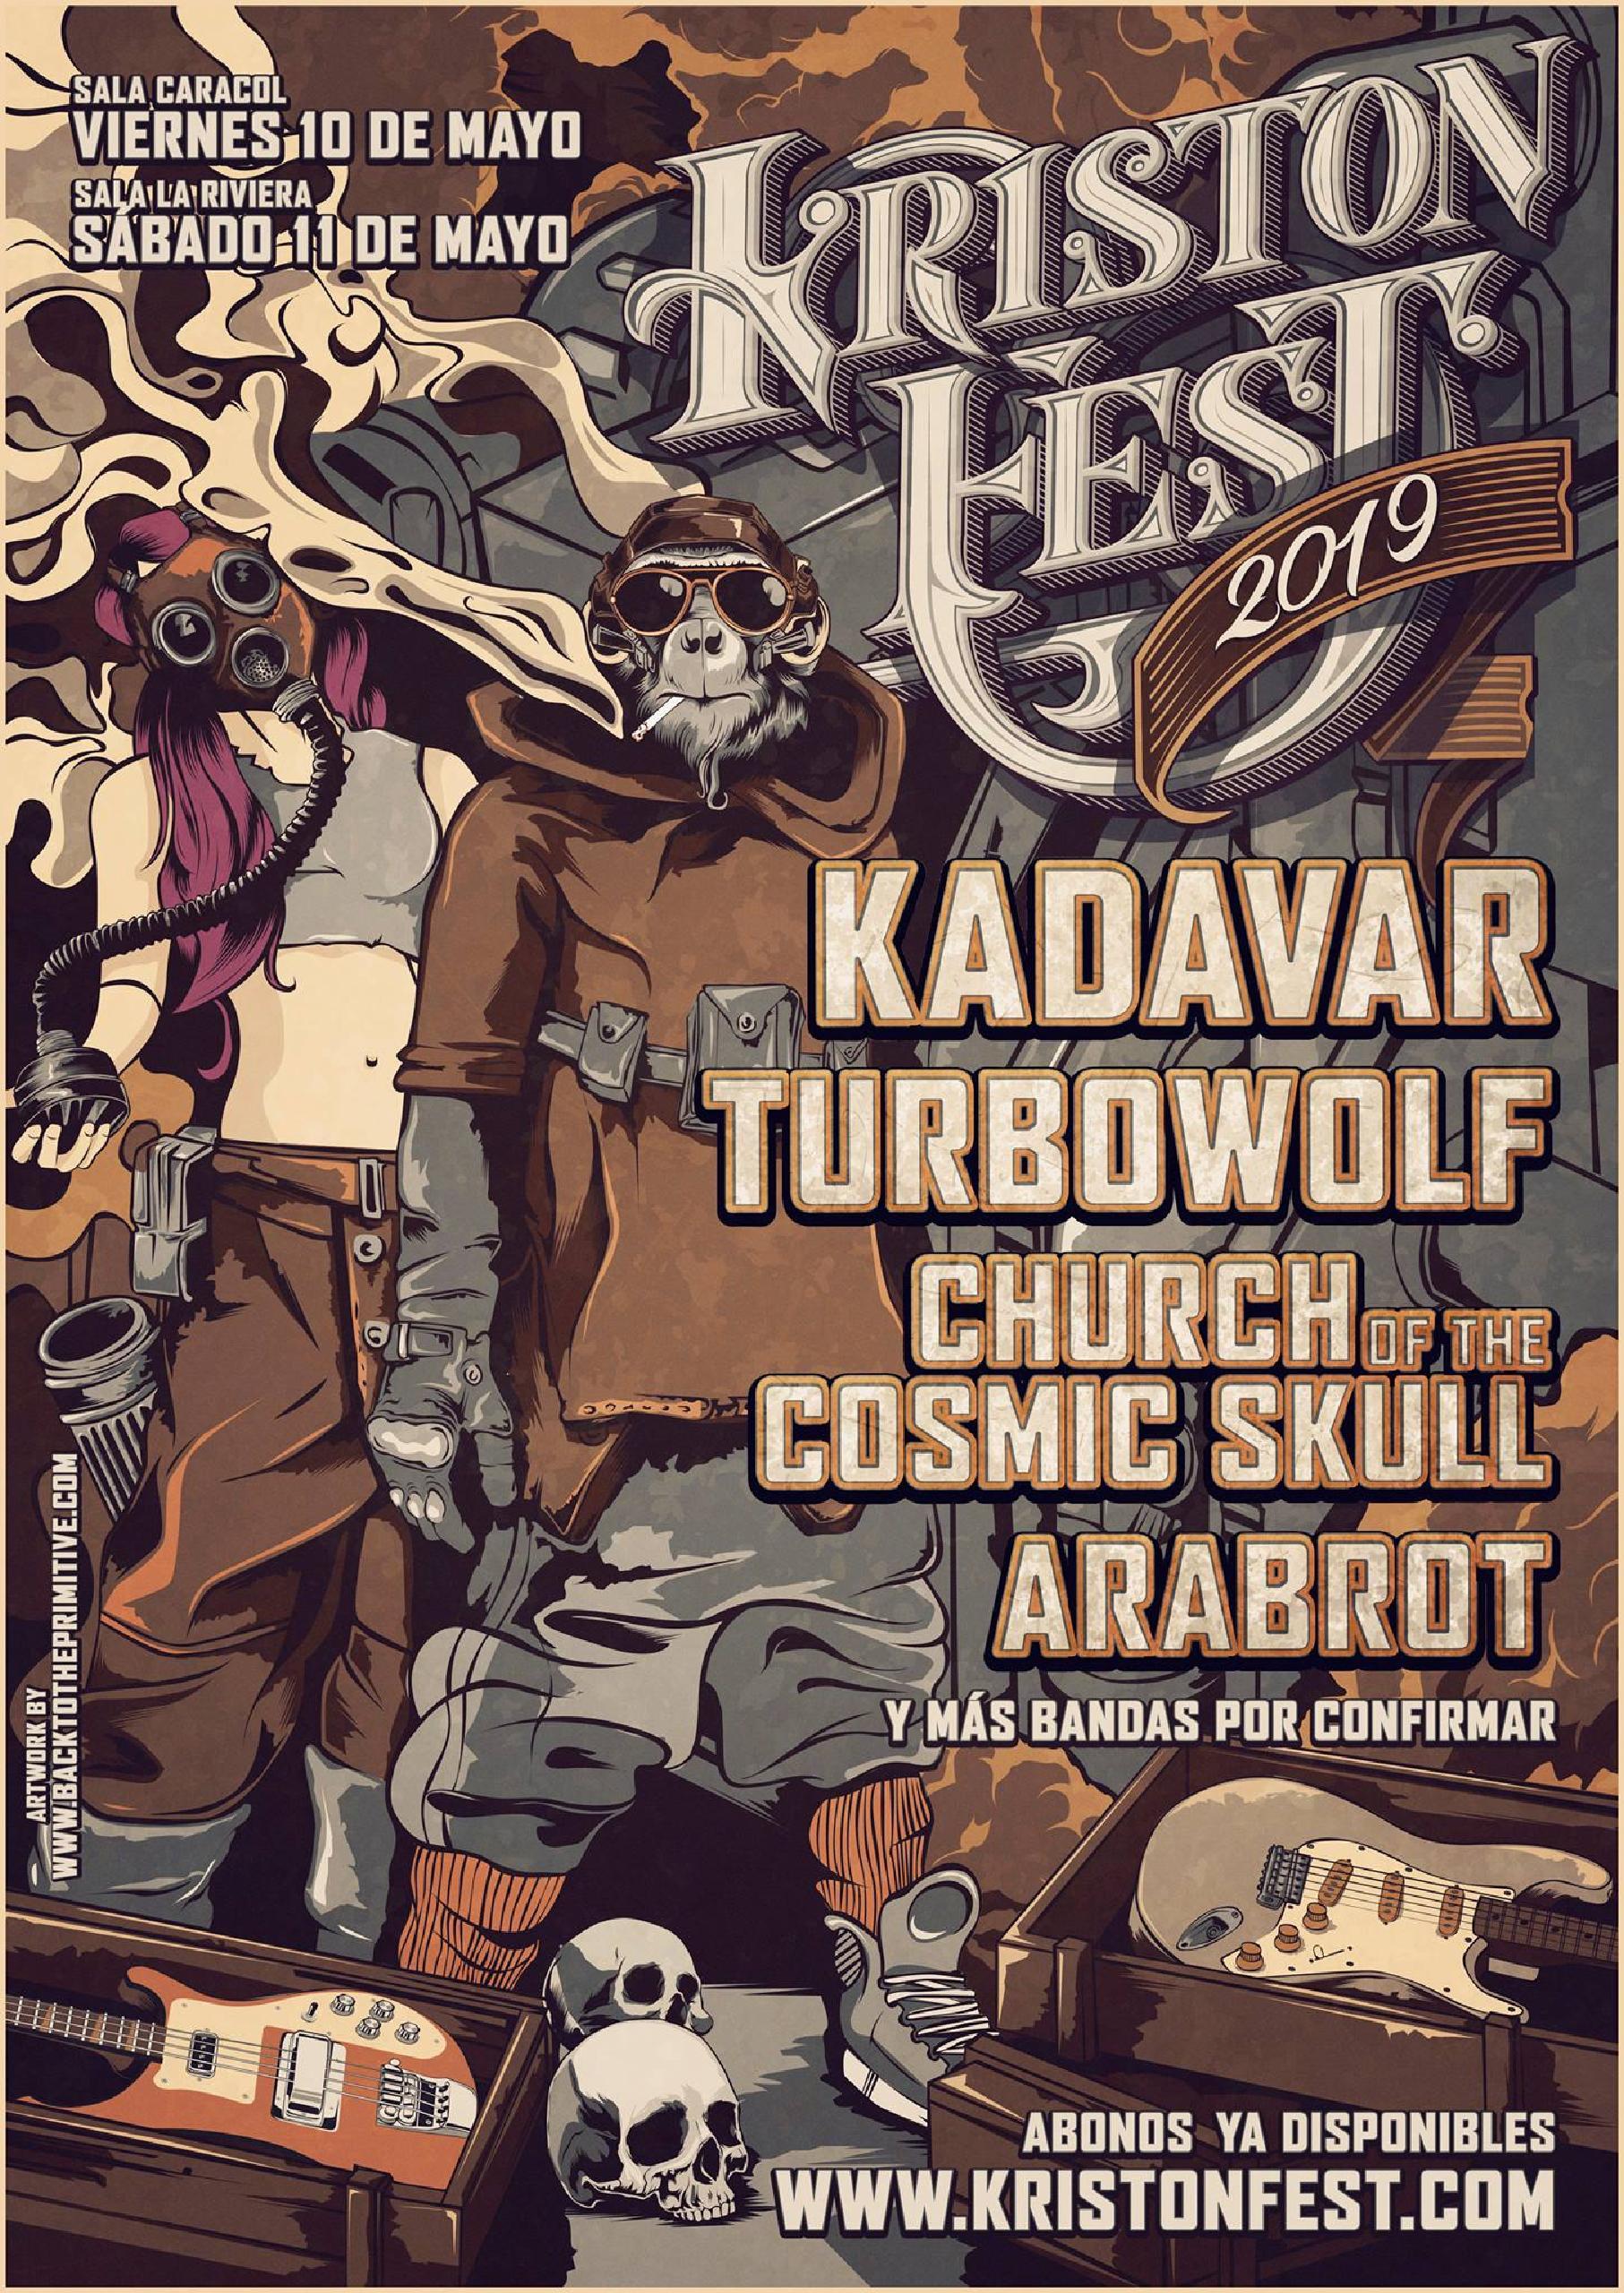 Cartel Kriston Fest 2019